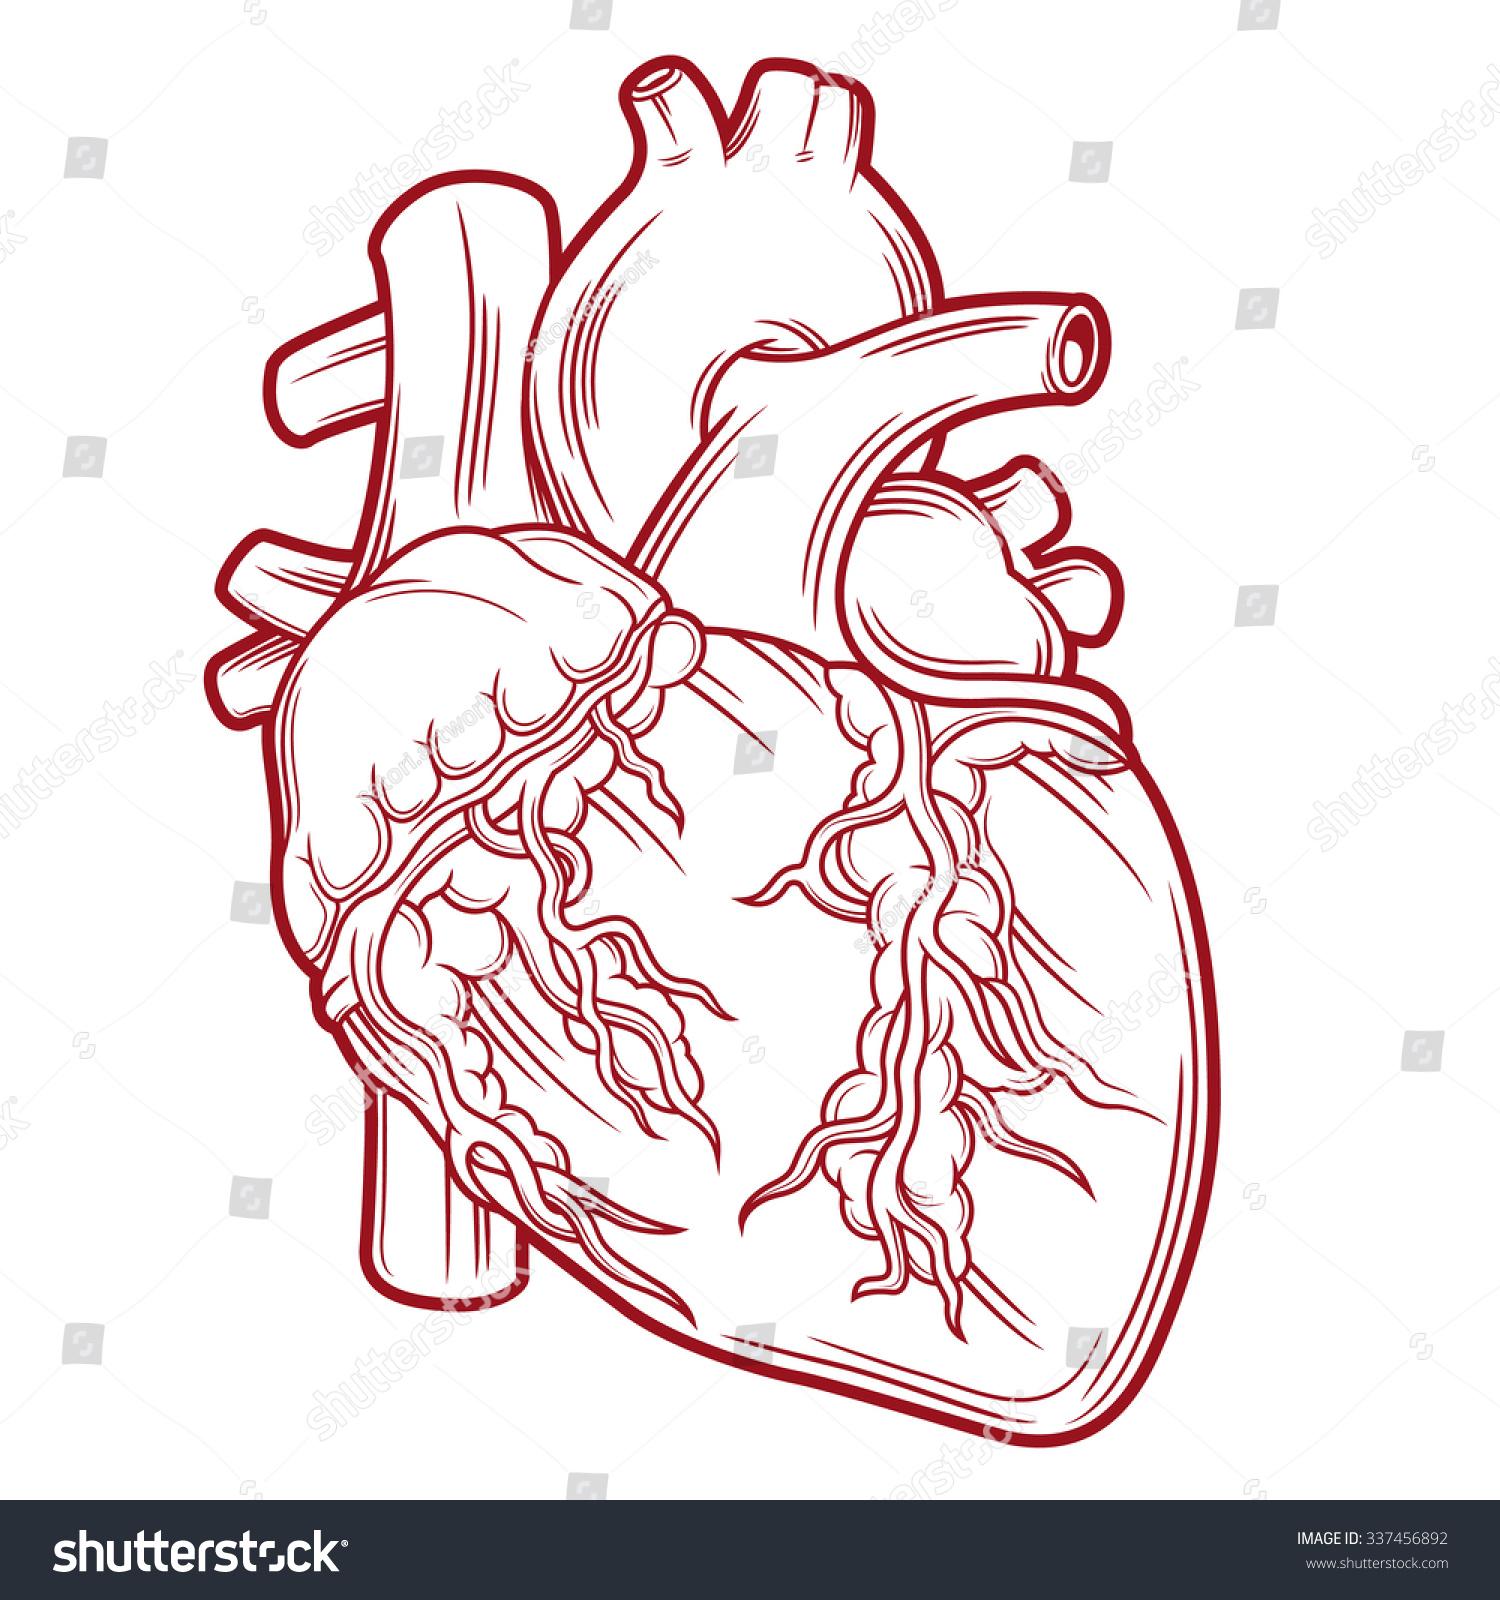 Anatomical Heart Stock Vector